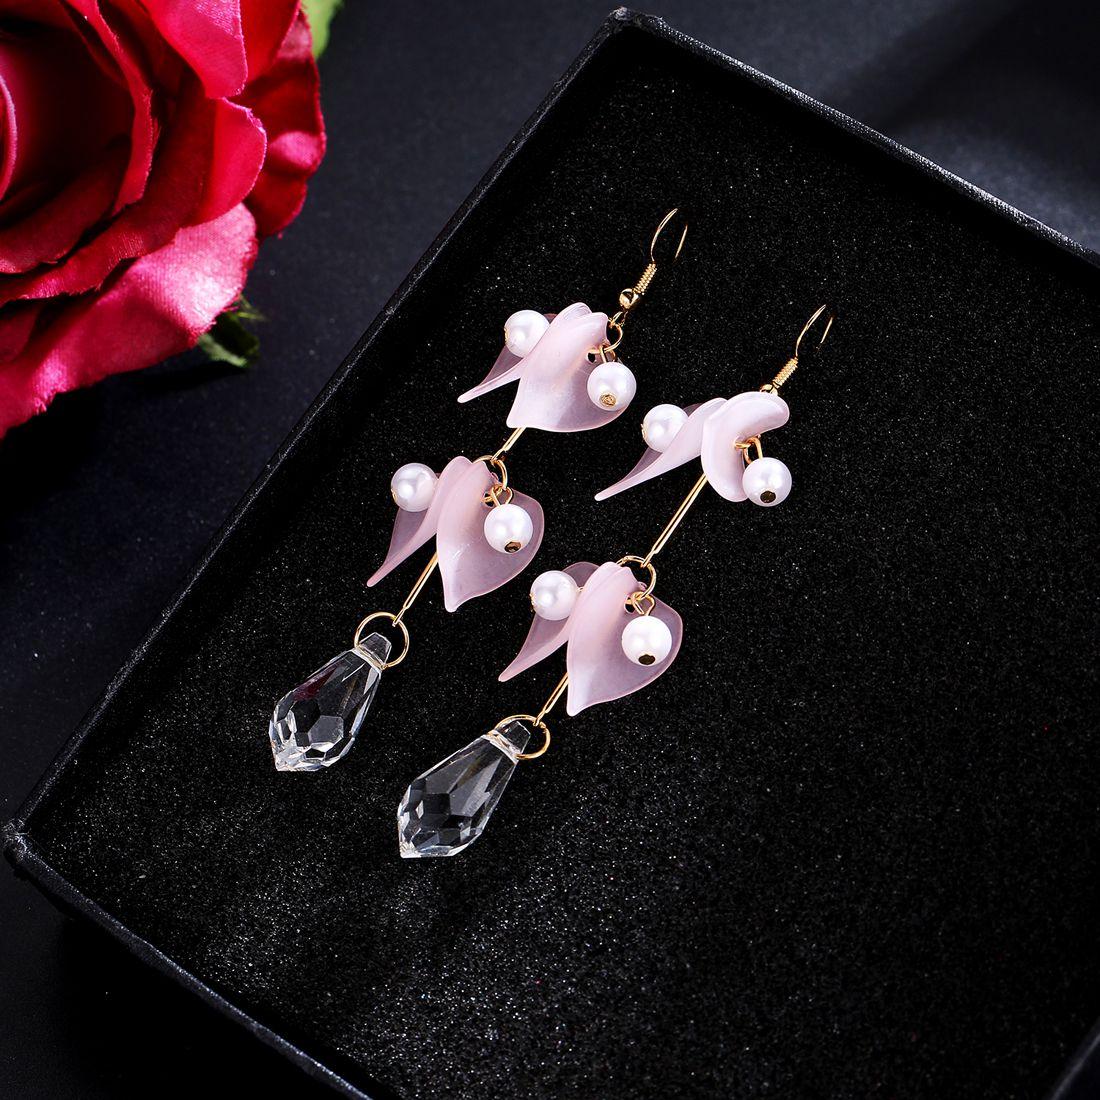 Jewels Galaxy Wonderful Pearls Drop Petals Design Crystal Pink Drop Earrings For Women/Girls